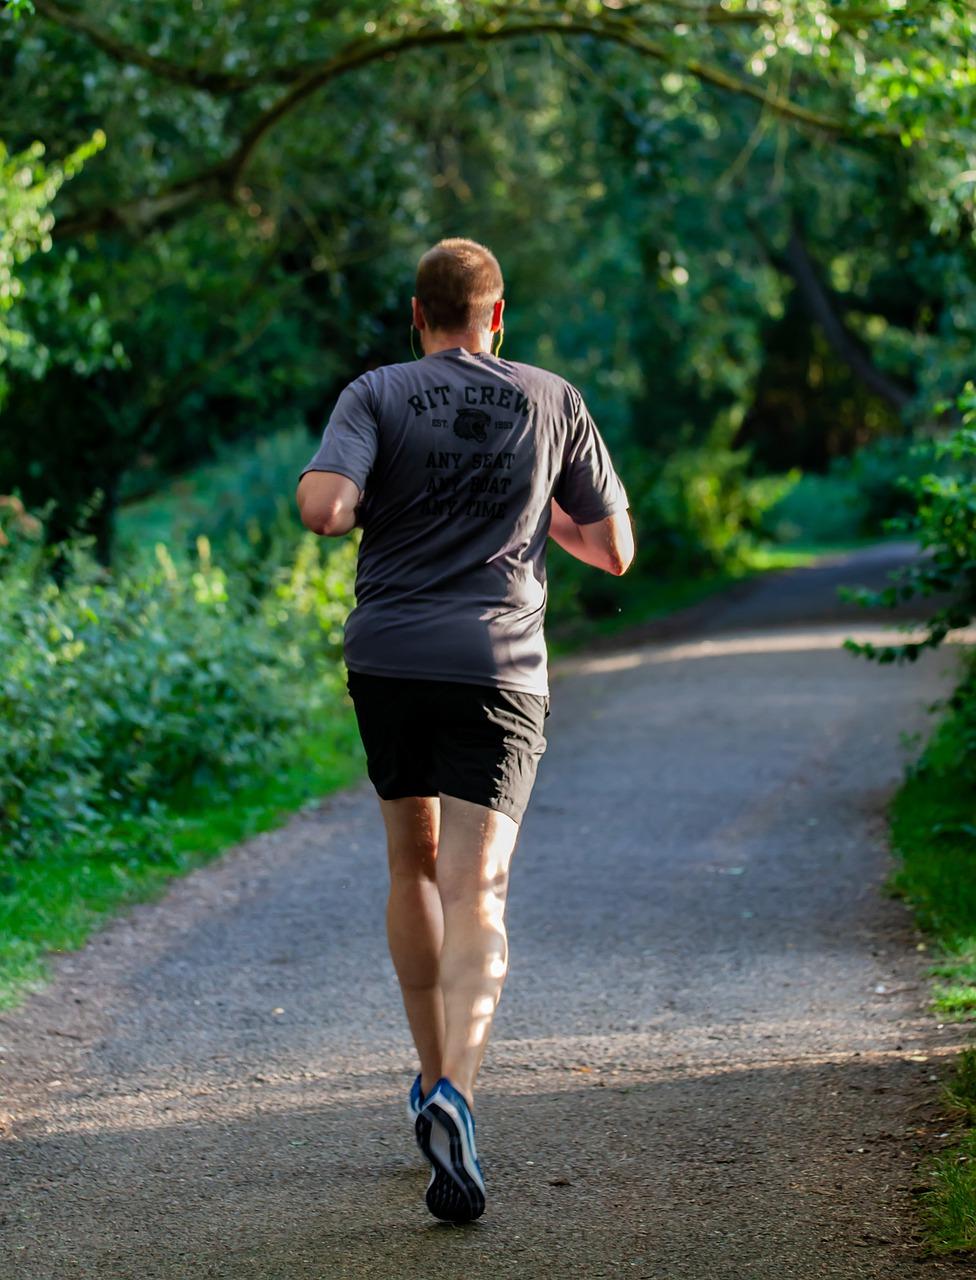 Runner, jogging, run in the park